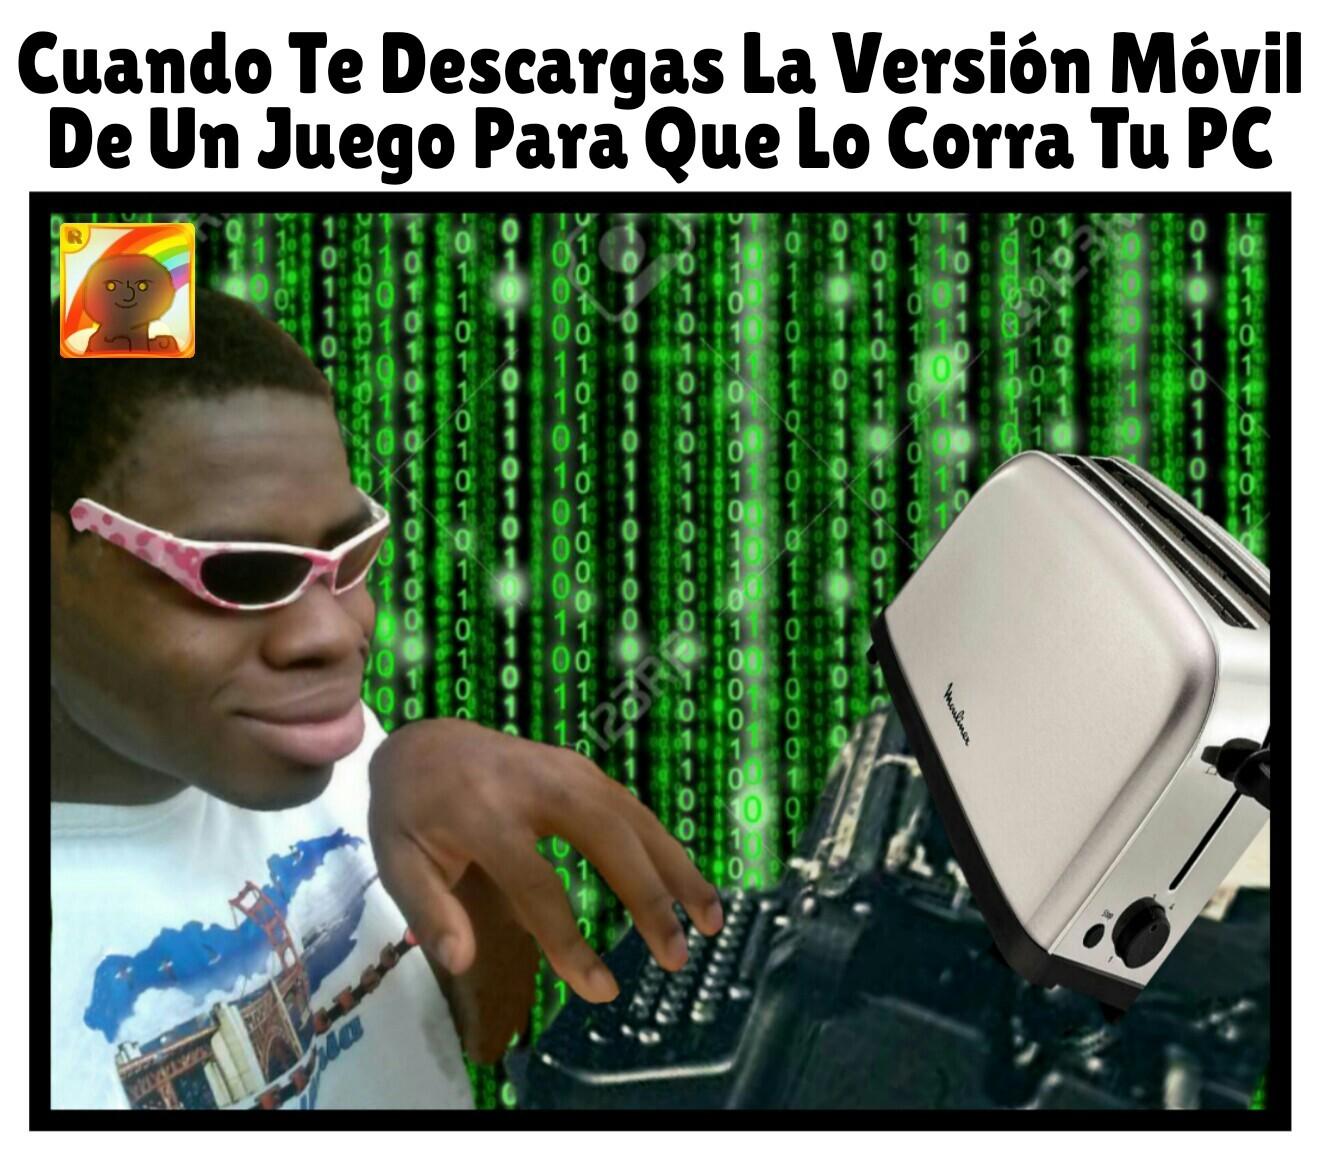 Versión Móvil - meme